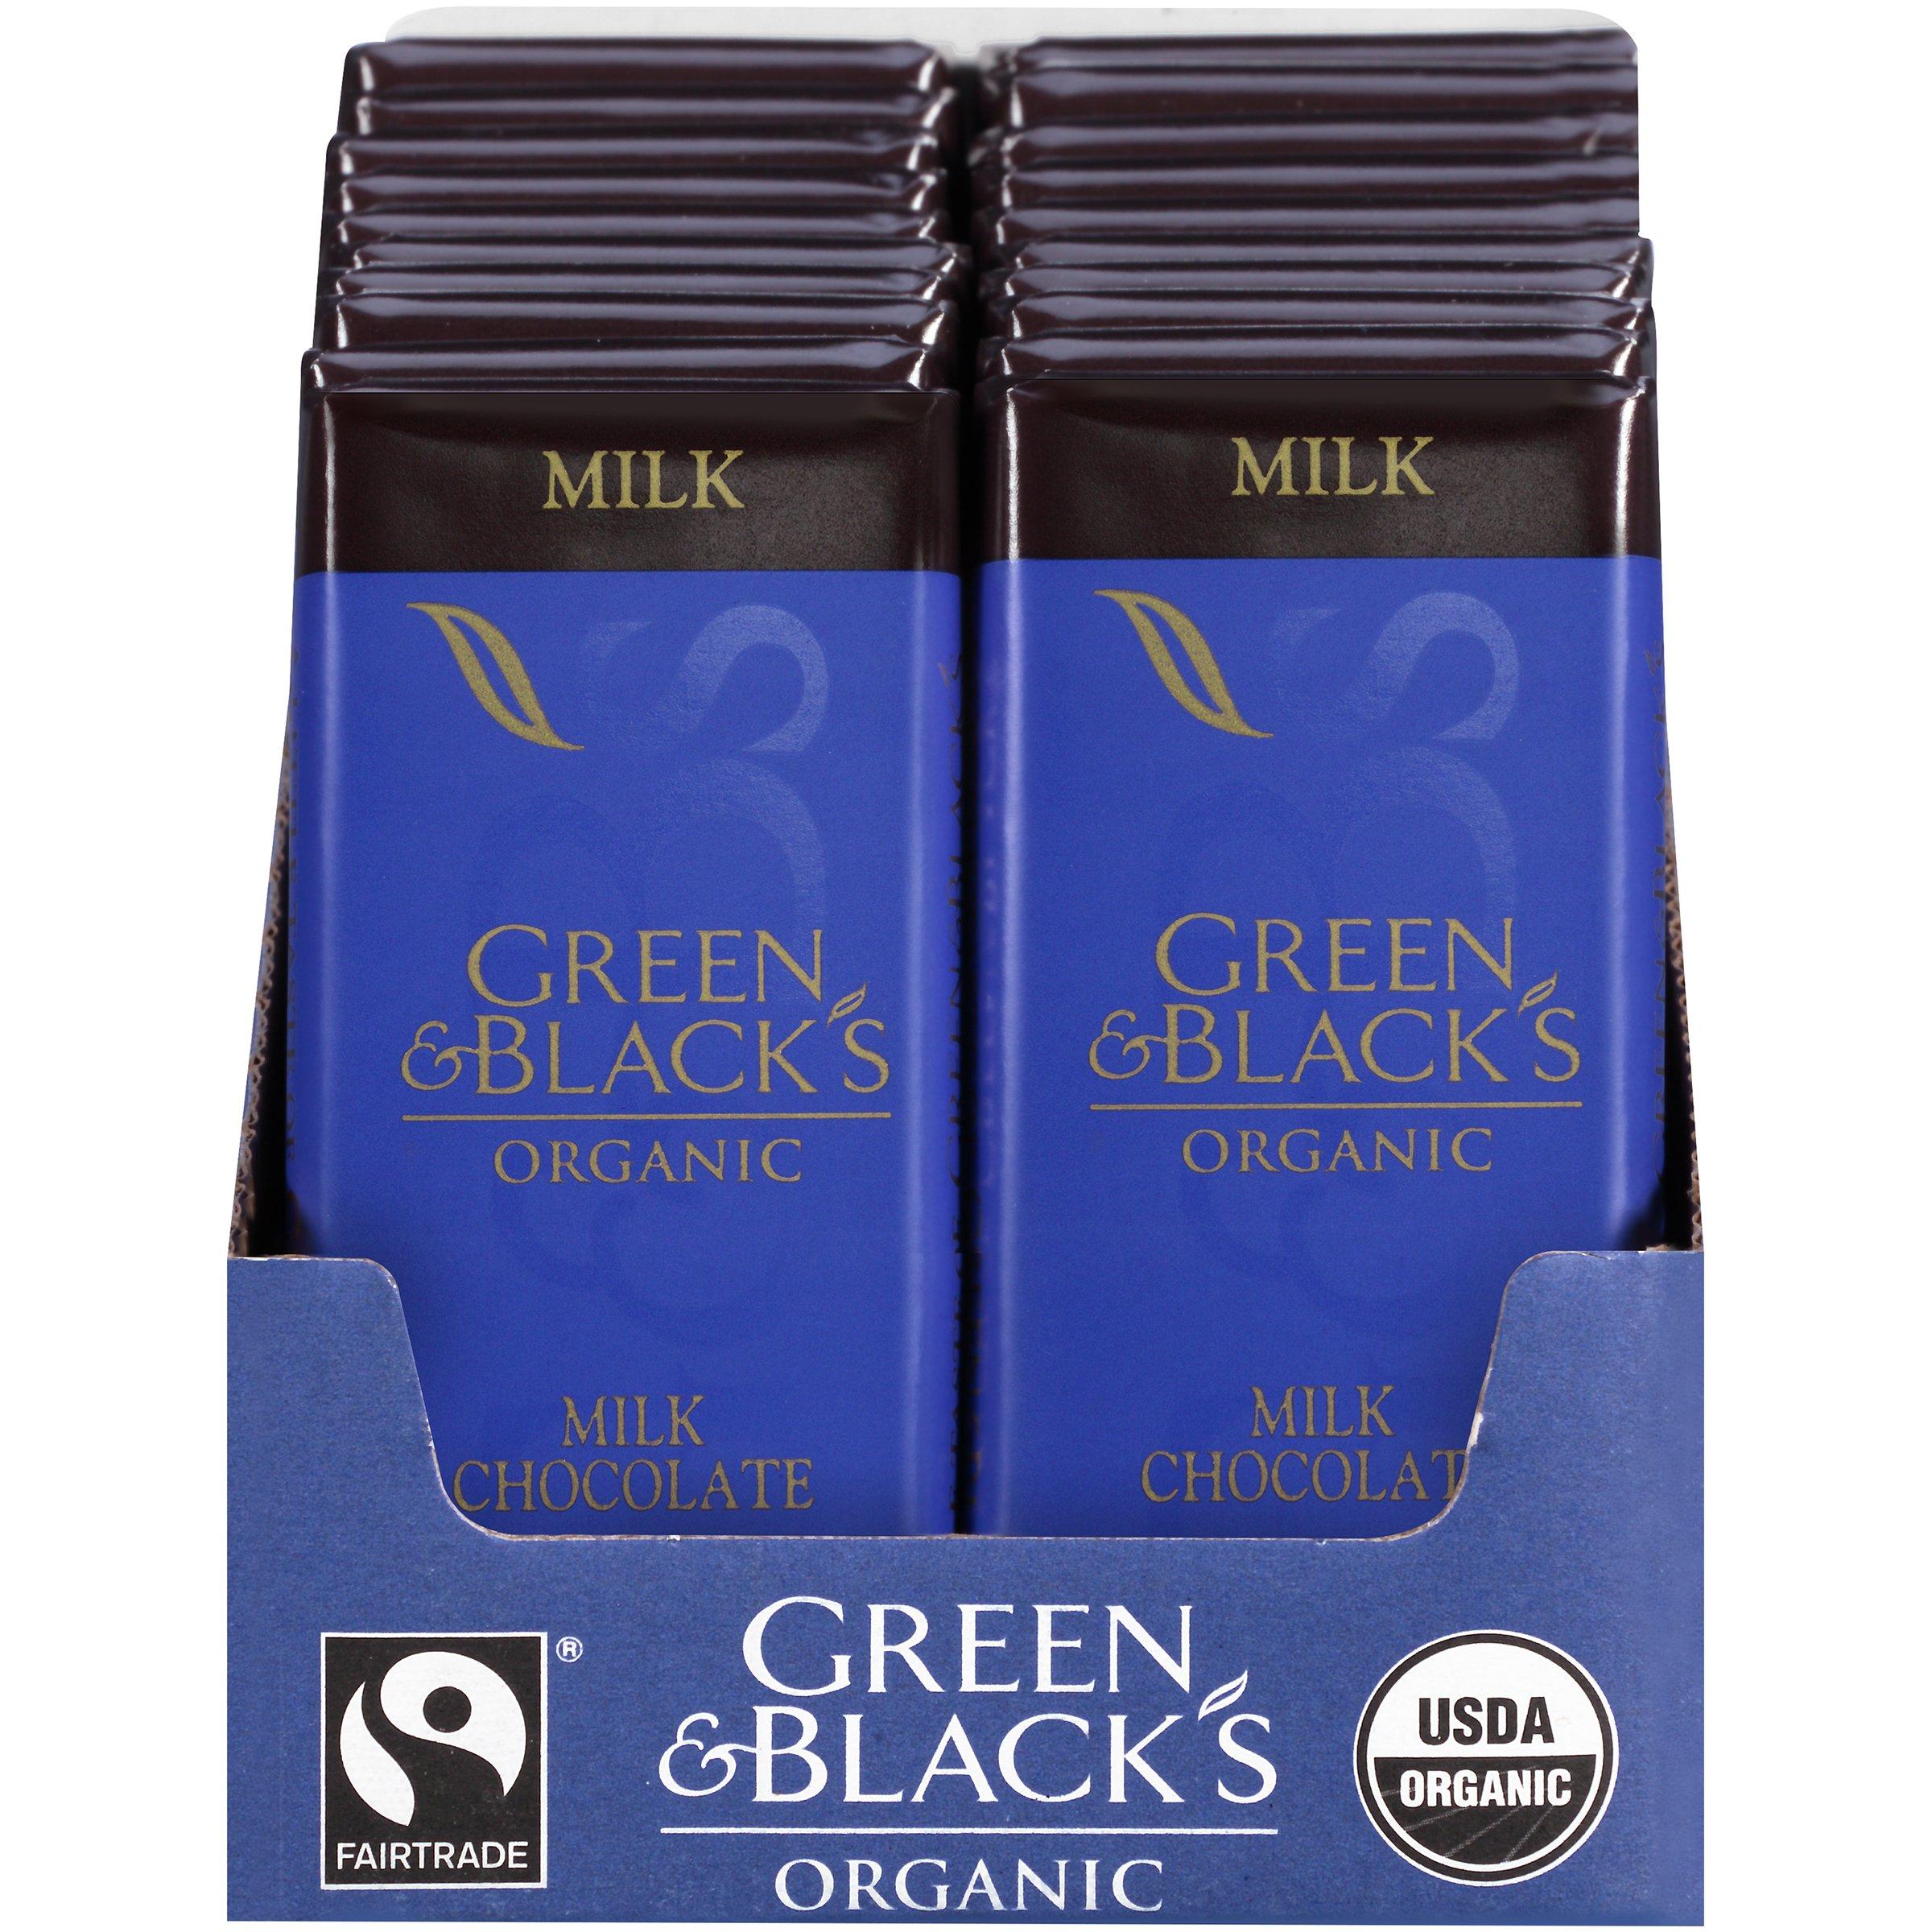 Green & Black's Organic Milk Chocolate (20 total bars) Bars by Green & Black's